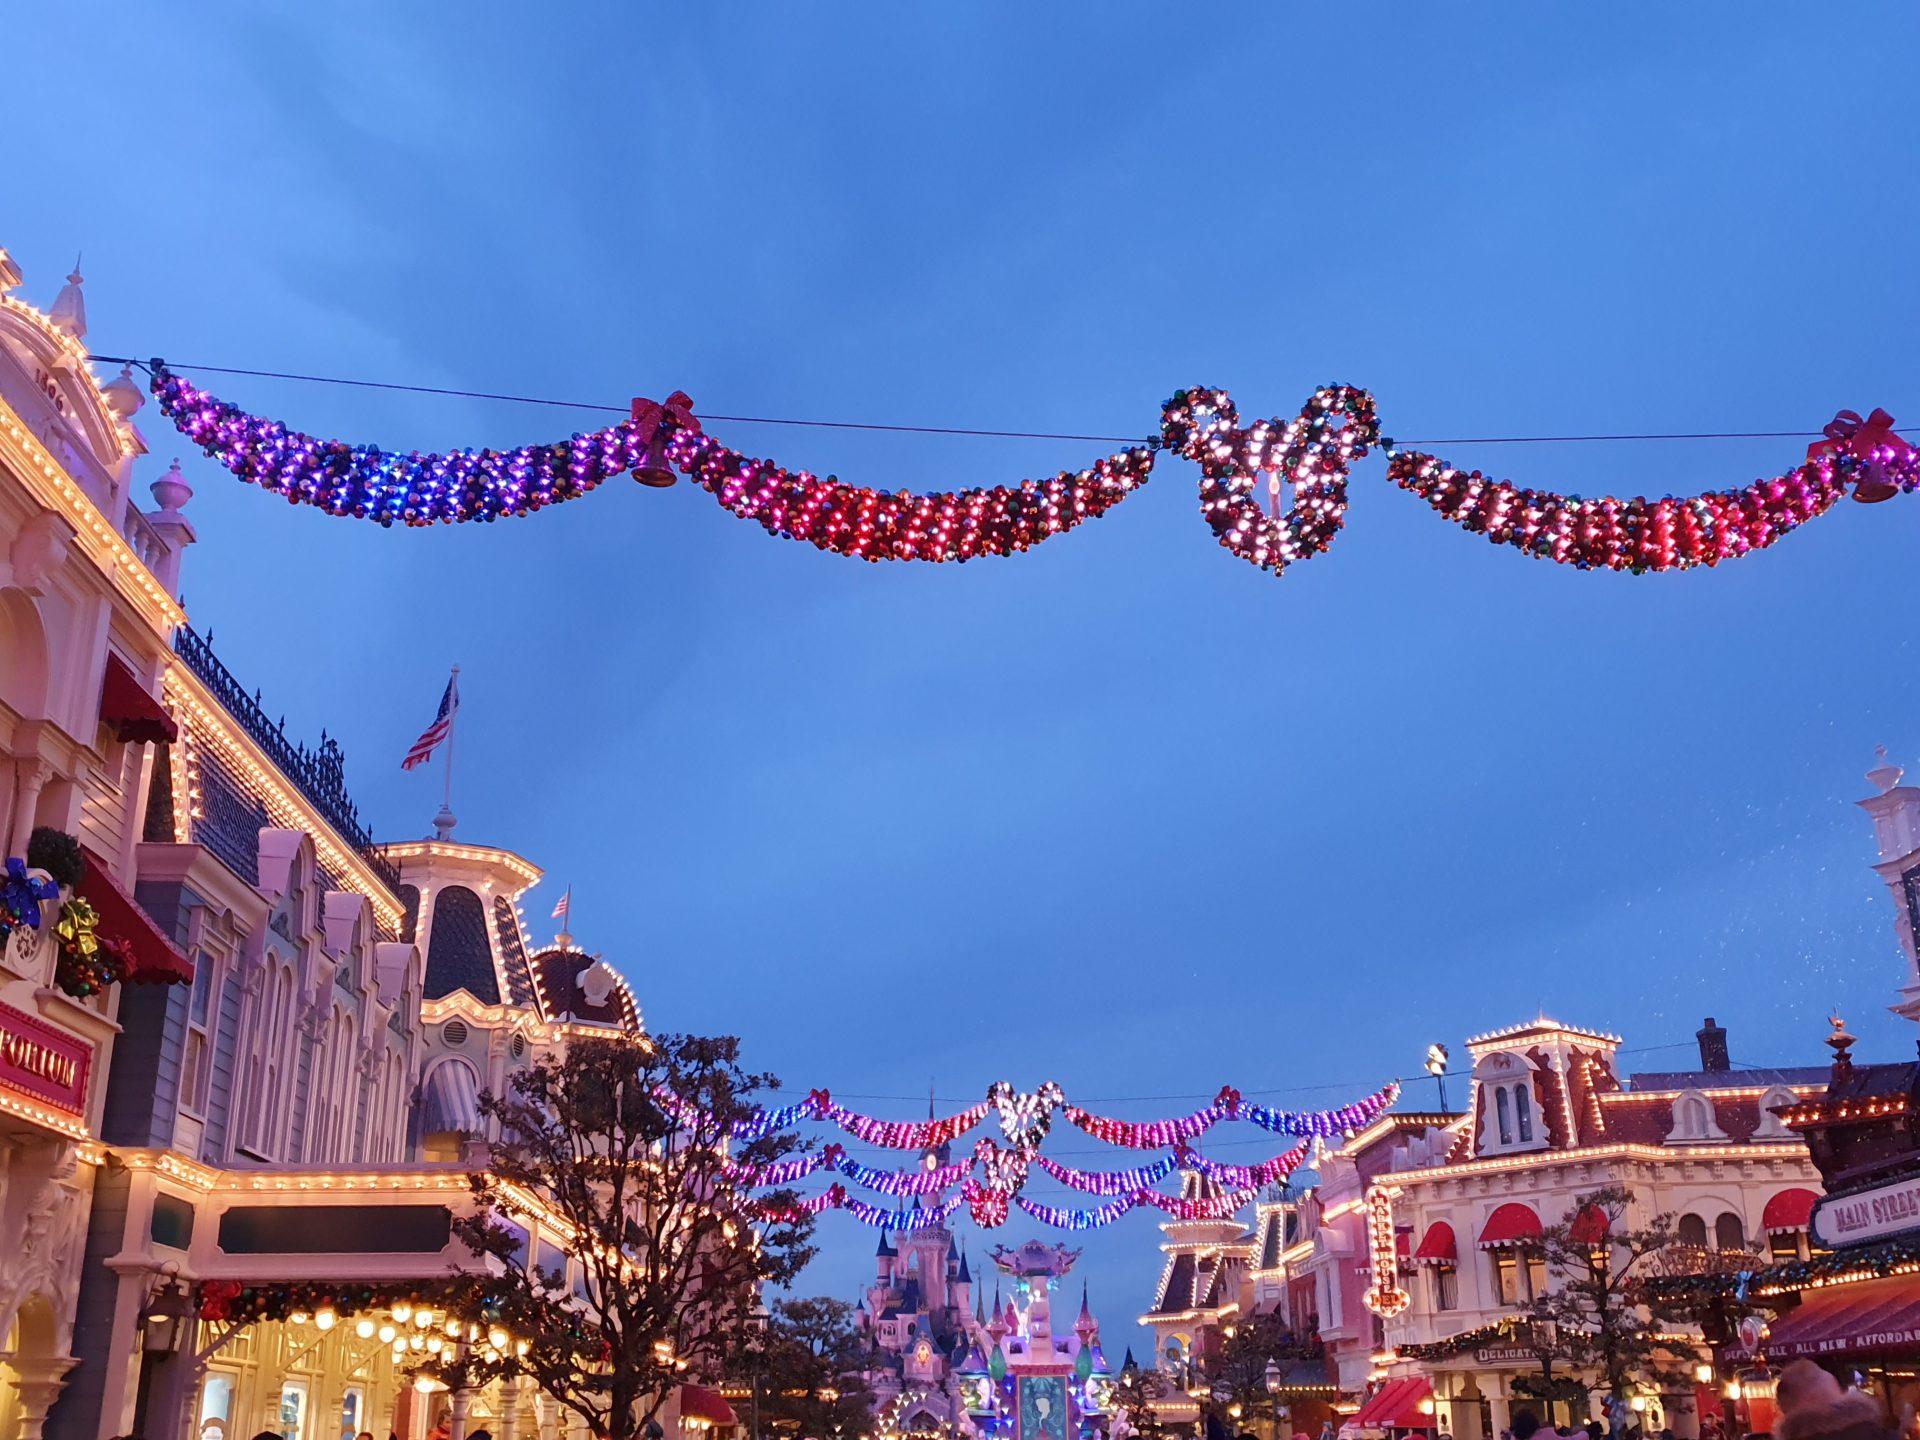 Decorazioni natalizie a Disneyland Paris